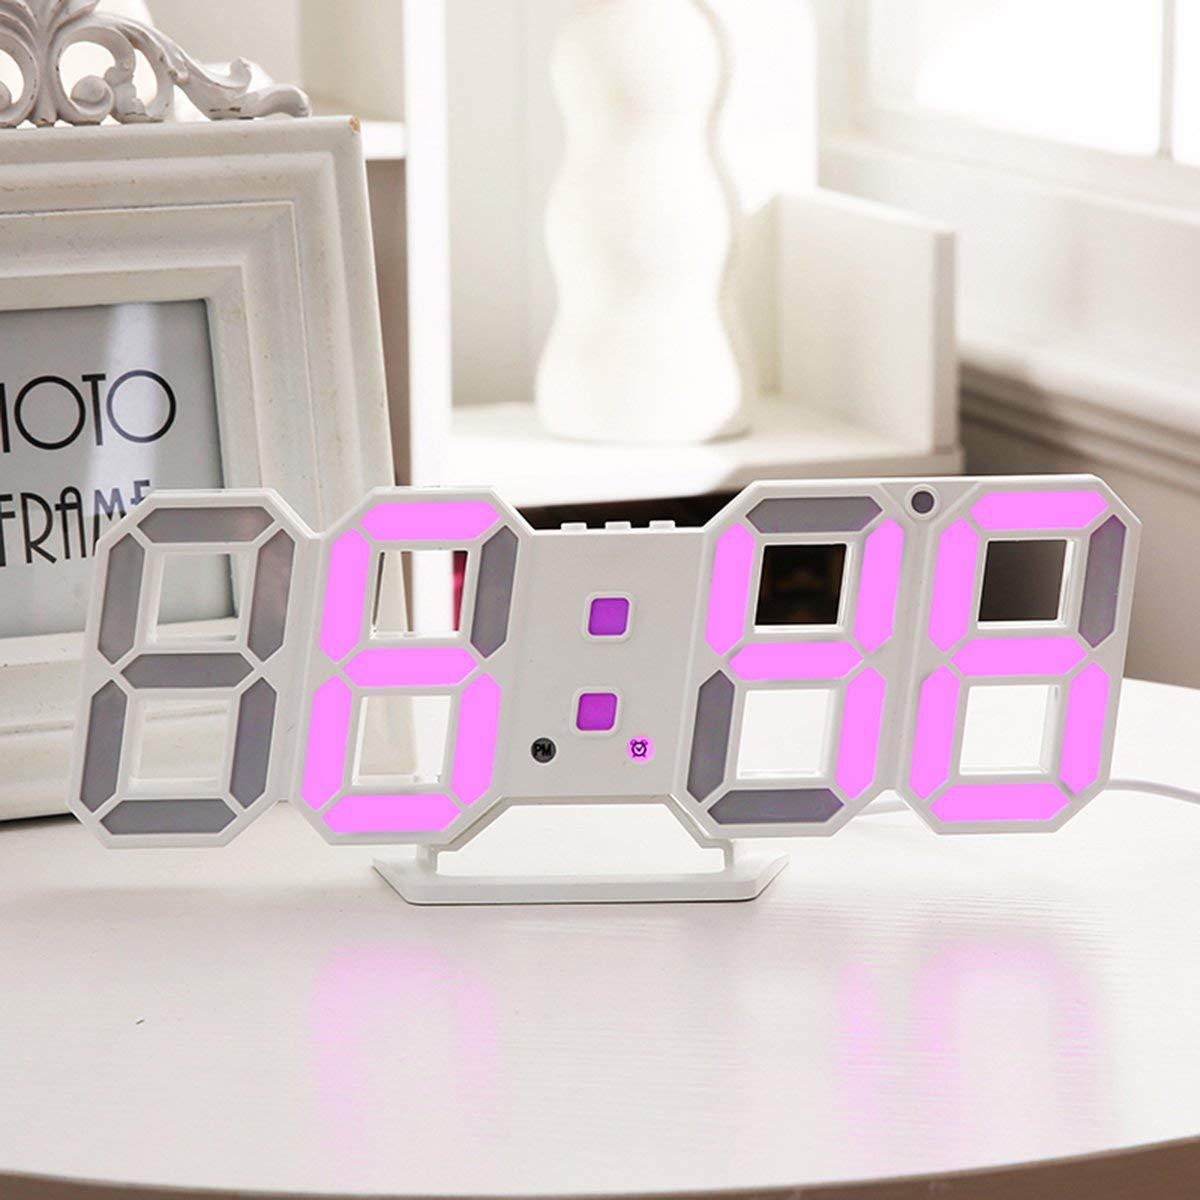 Loyal 3d Led Wall Clock Modern Digital Table Desktop Alarm Clock Nightlight Saat Wall Clock For Home Living Room Office 24 Or 12 Hour Home & Garden